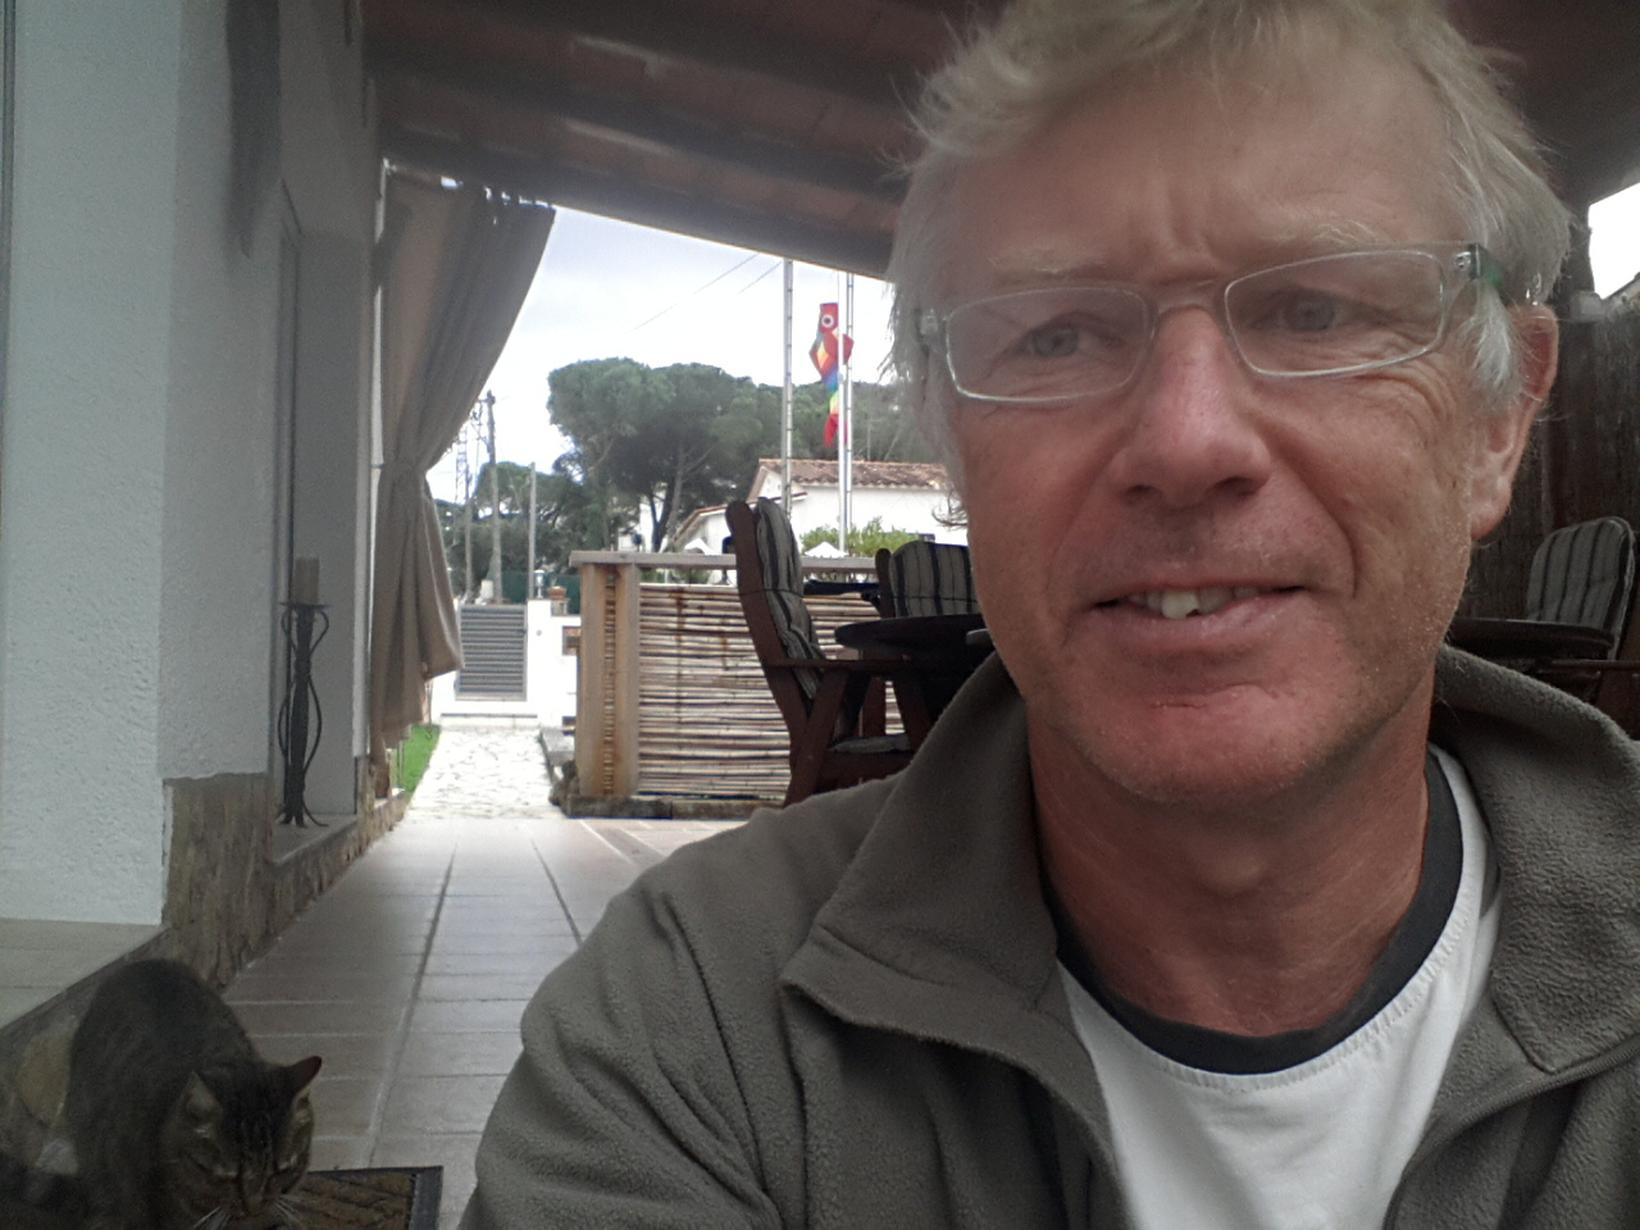 Mick from Girona, Spain